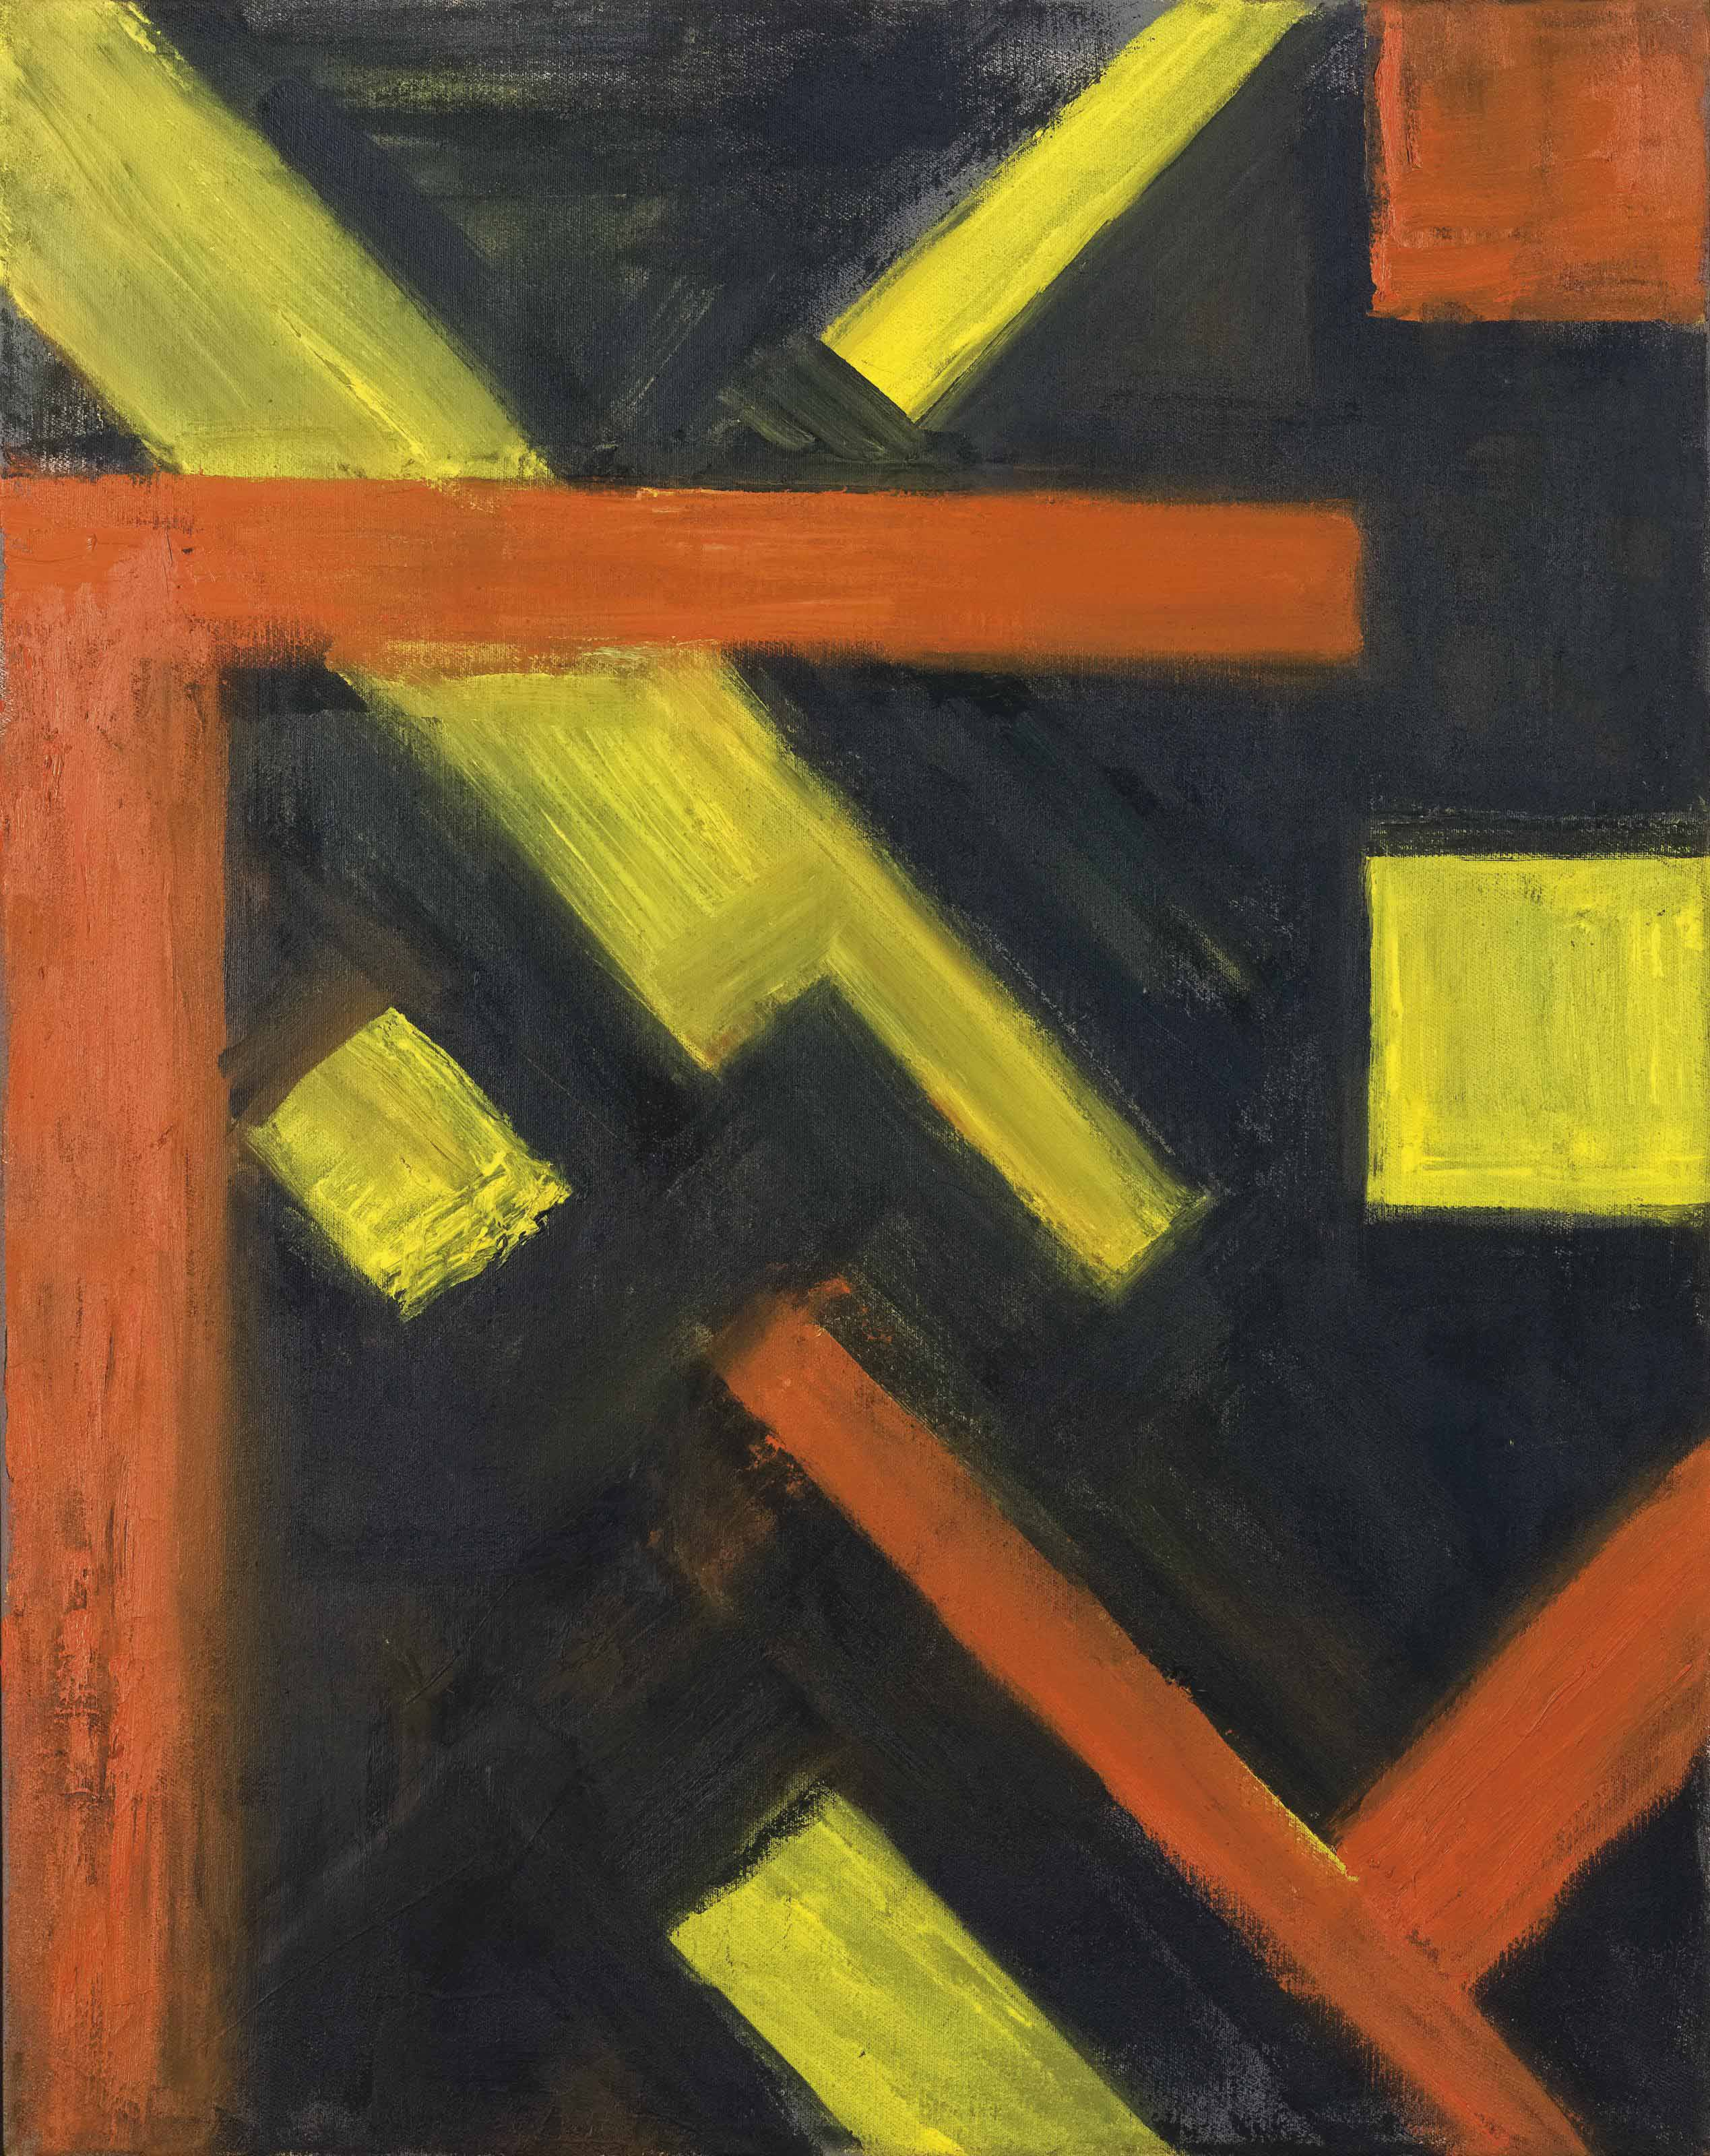 Geometrical work in yellow, red & black